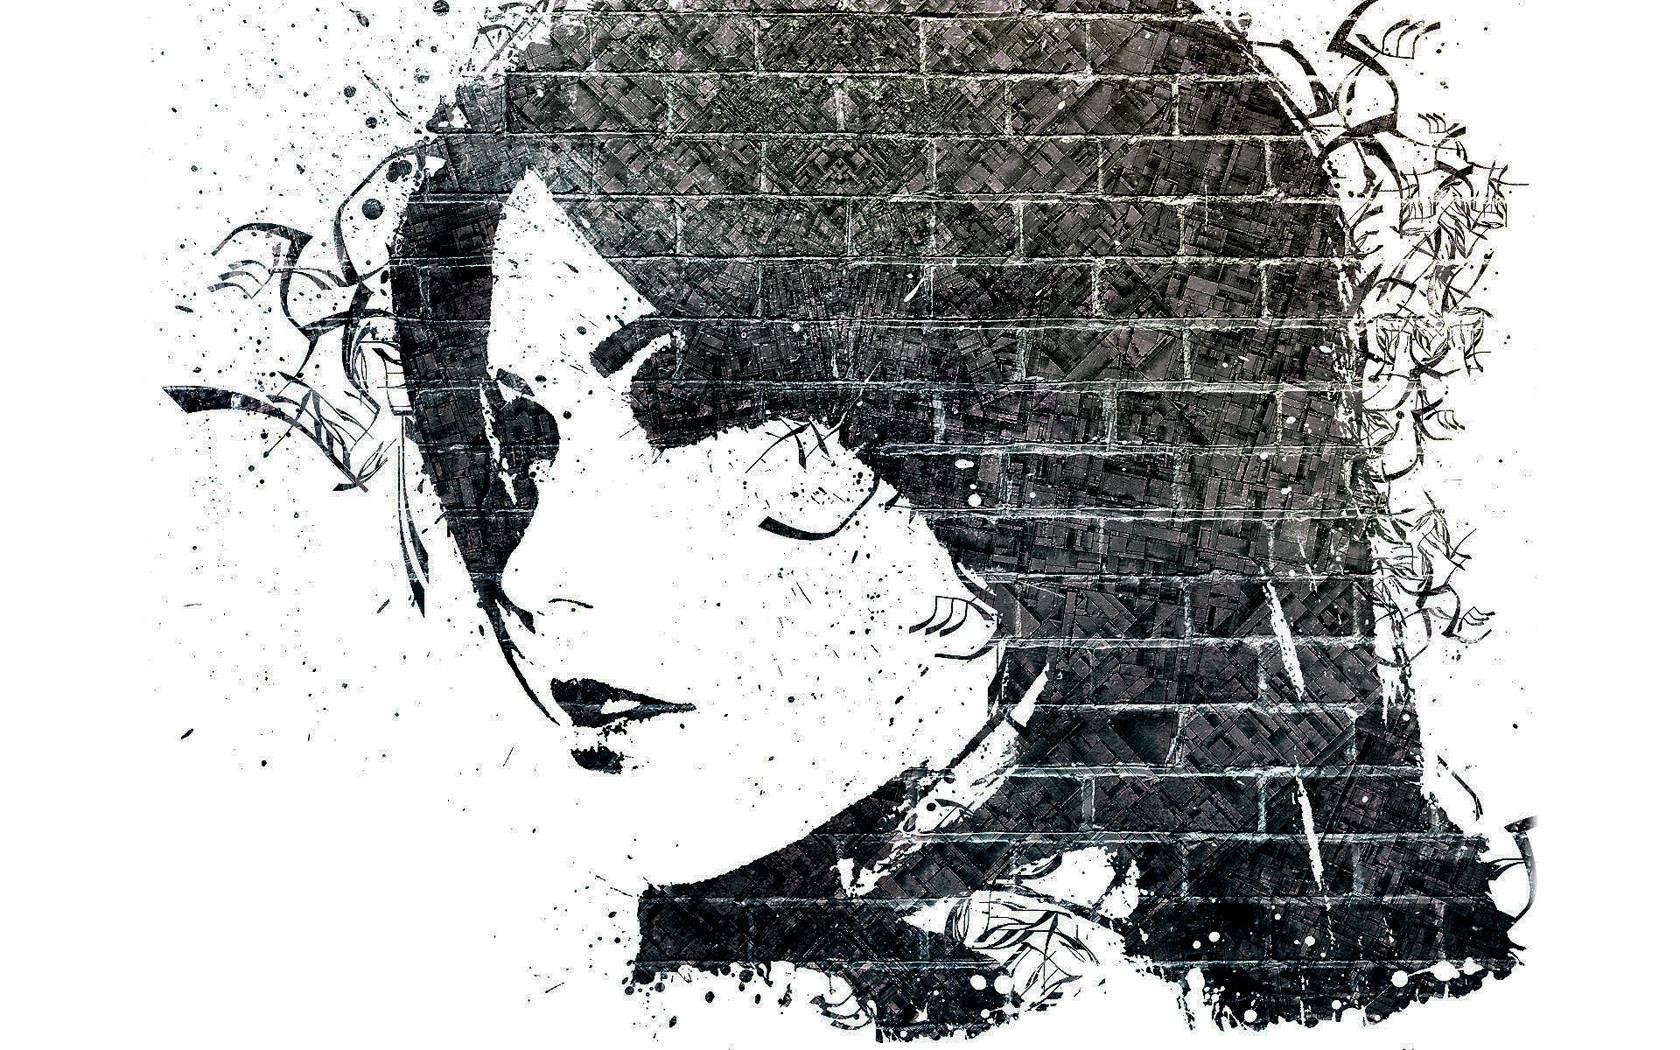 artwork black background genius - photo #11